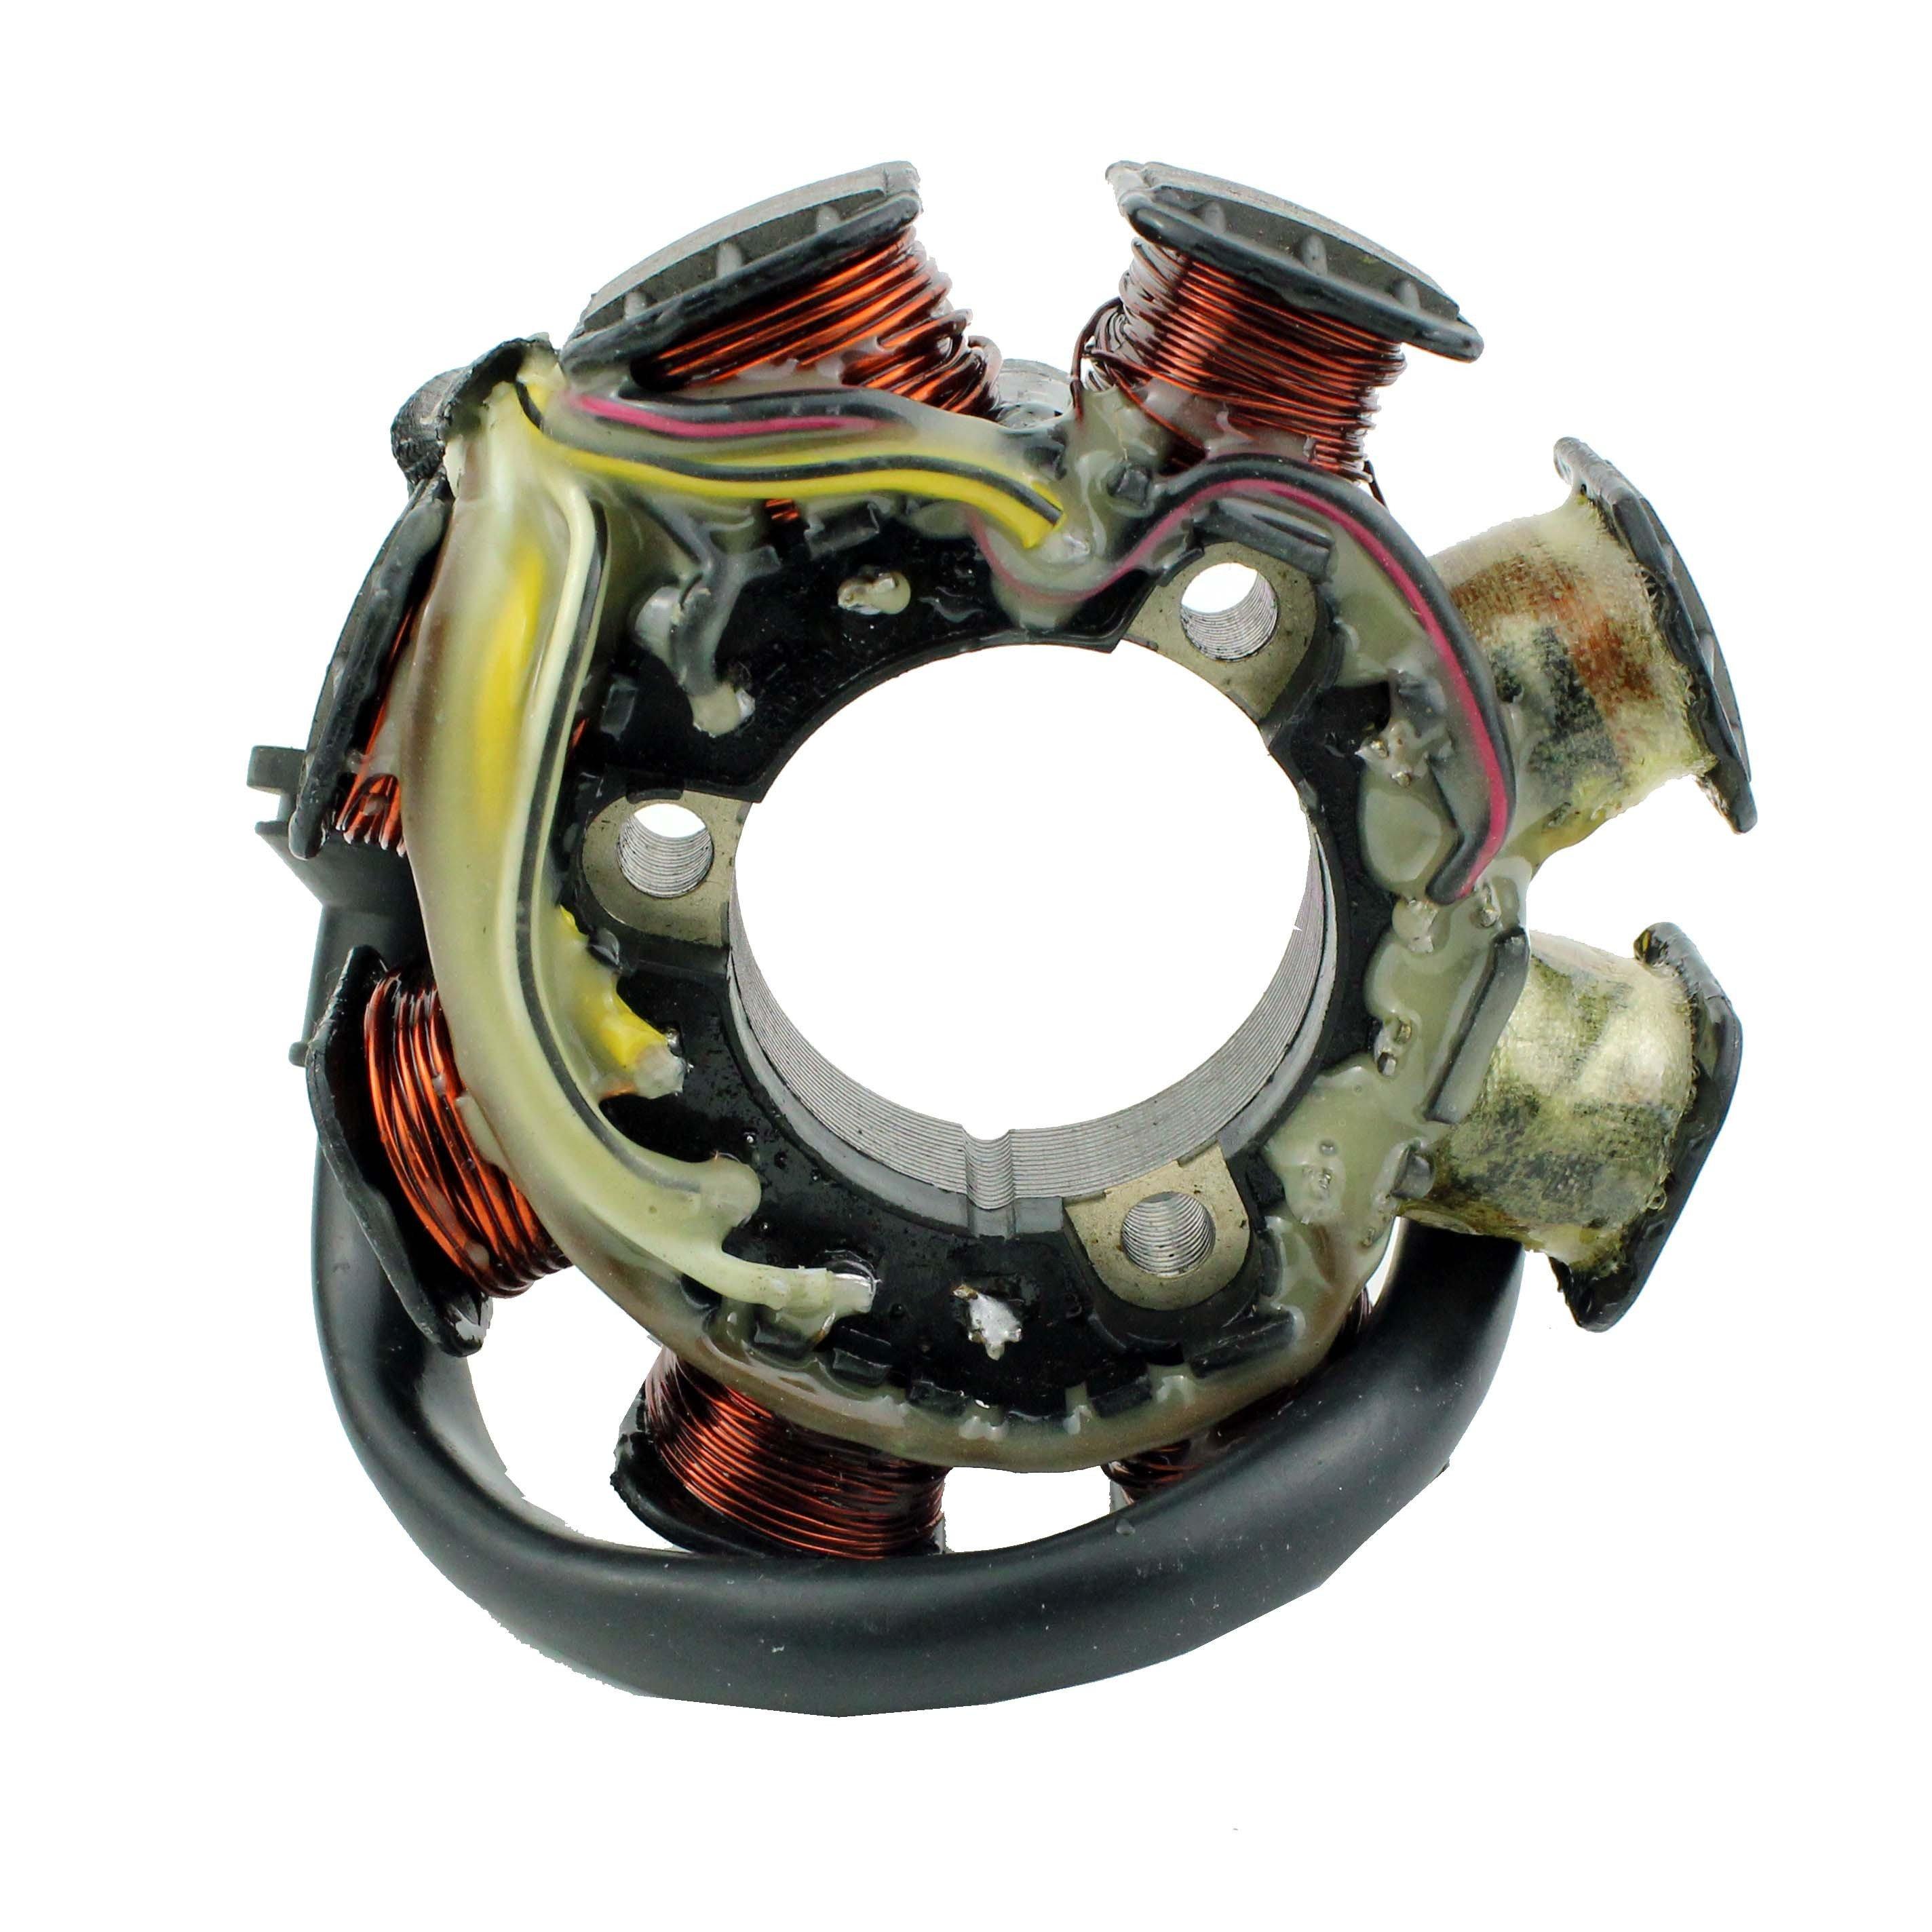 yamaha v max 600 st carb l c generator stator coil moto electrical yamaha v max 600 st carb l c stator coil replaces 8cc 85510 00 00